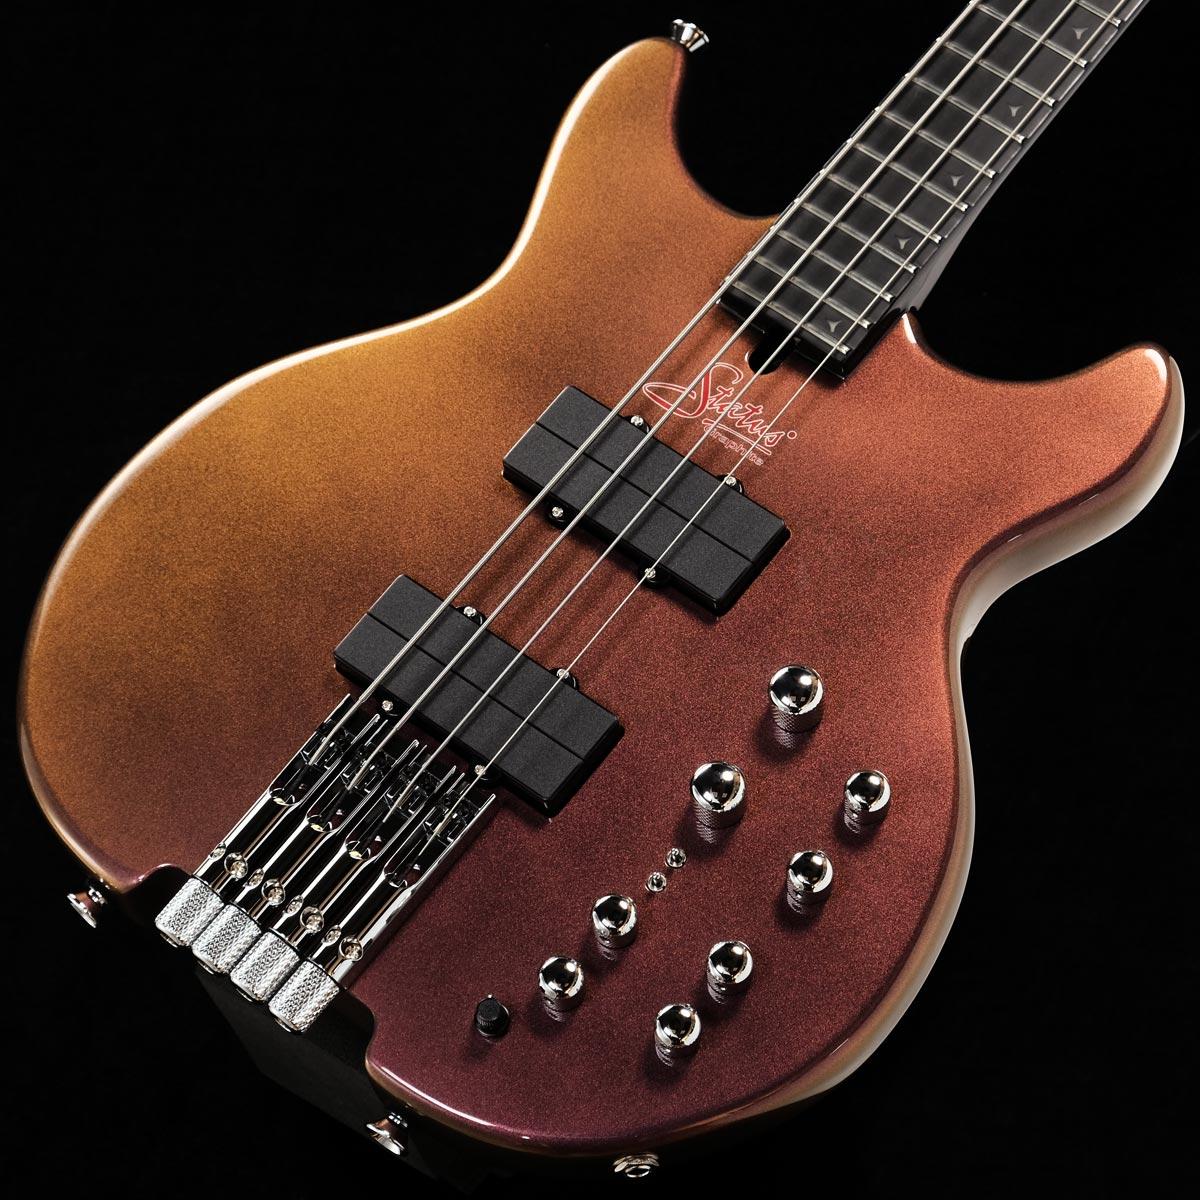 Status Graphite / King Bass Paramatrix Chameleon Tri Color LED PHOENIX 【S/N 0319492】【渋谷店】